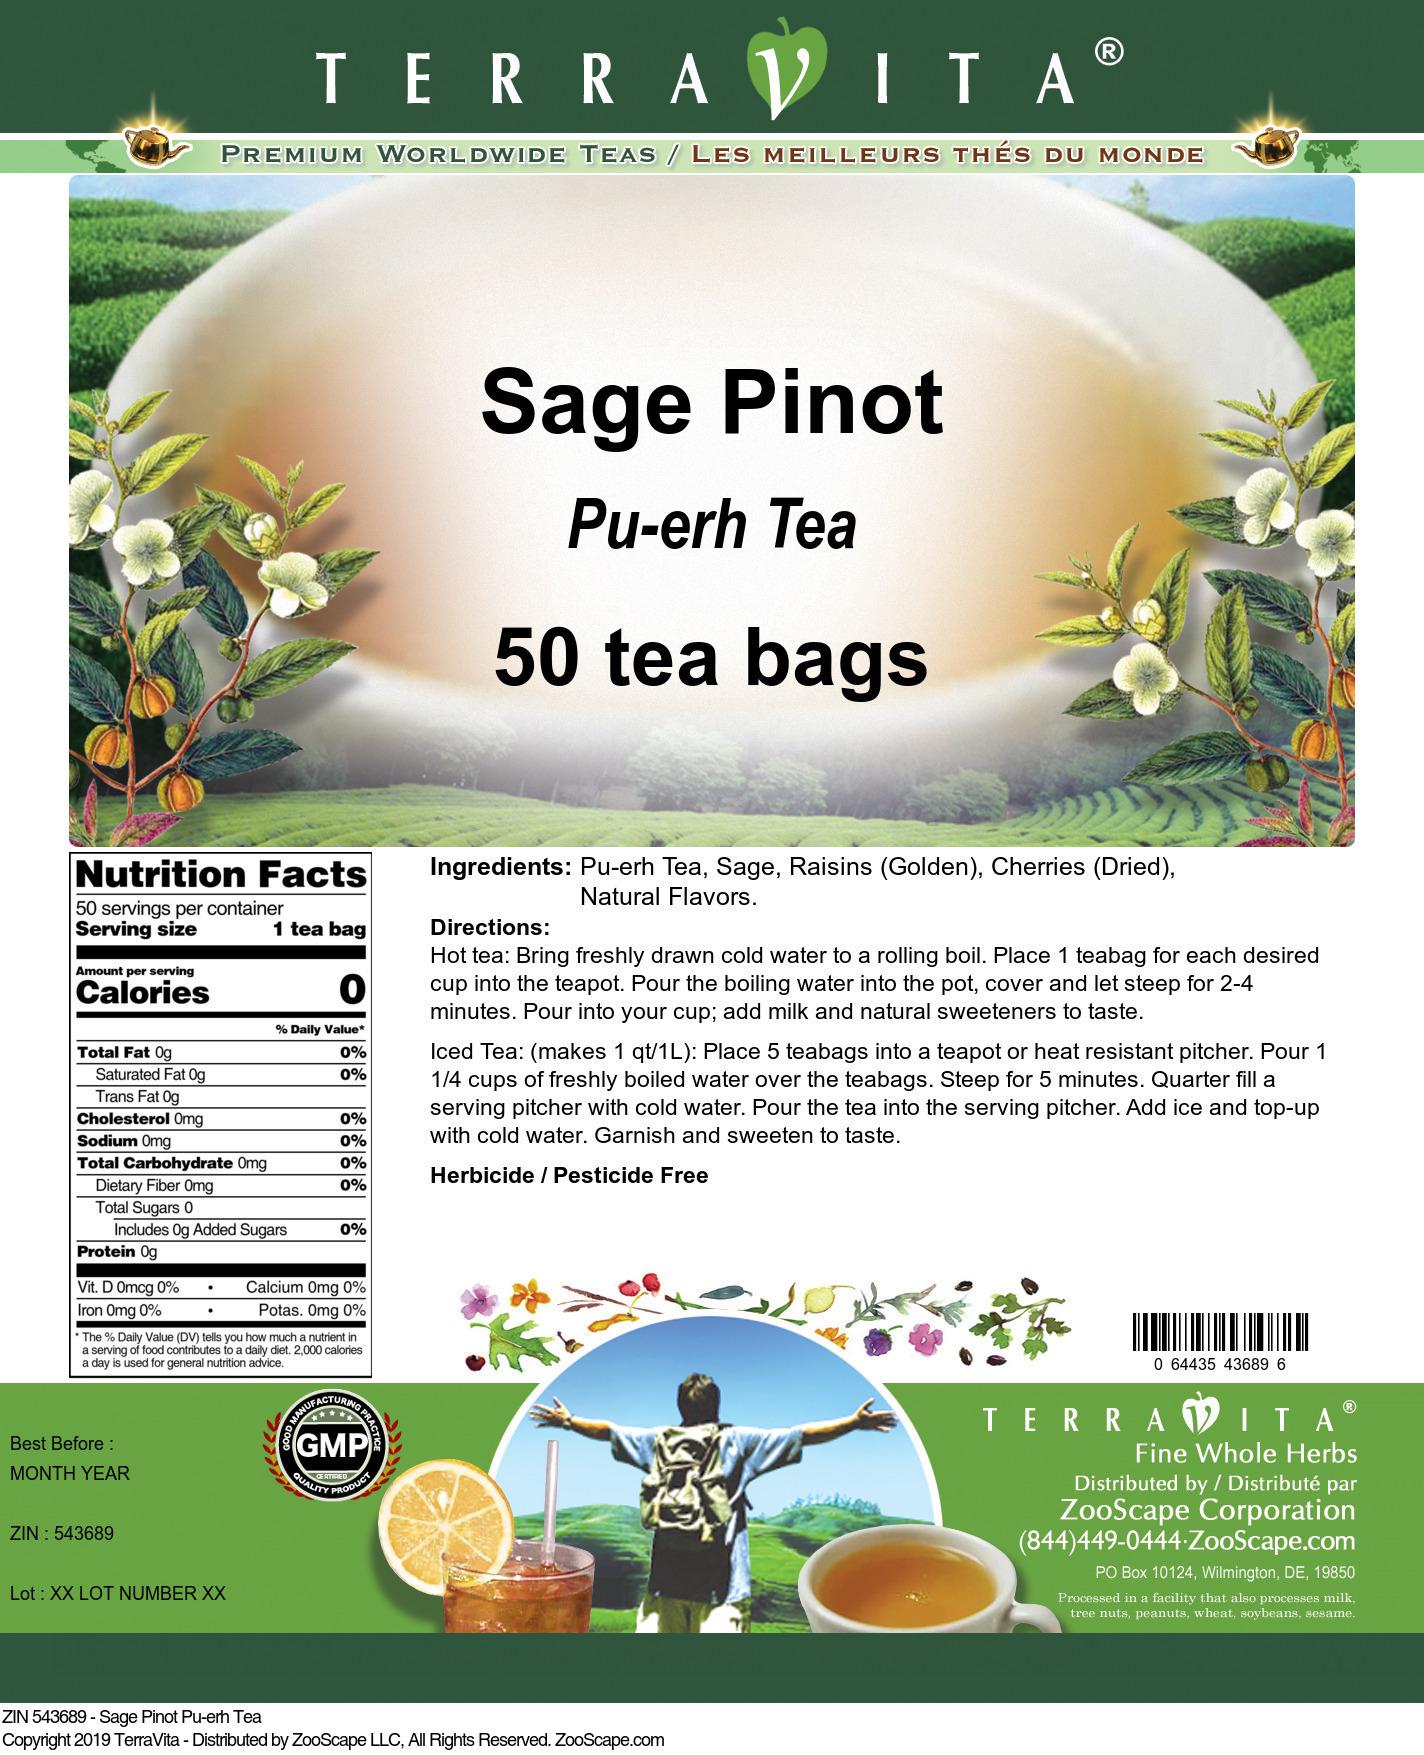 Sage Pinot Pu-erh Tea